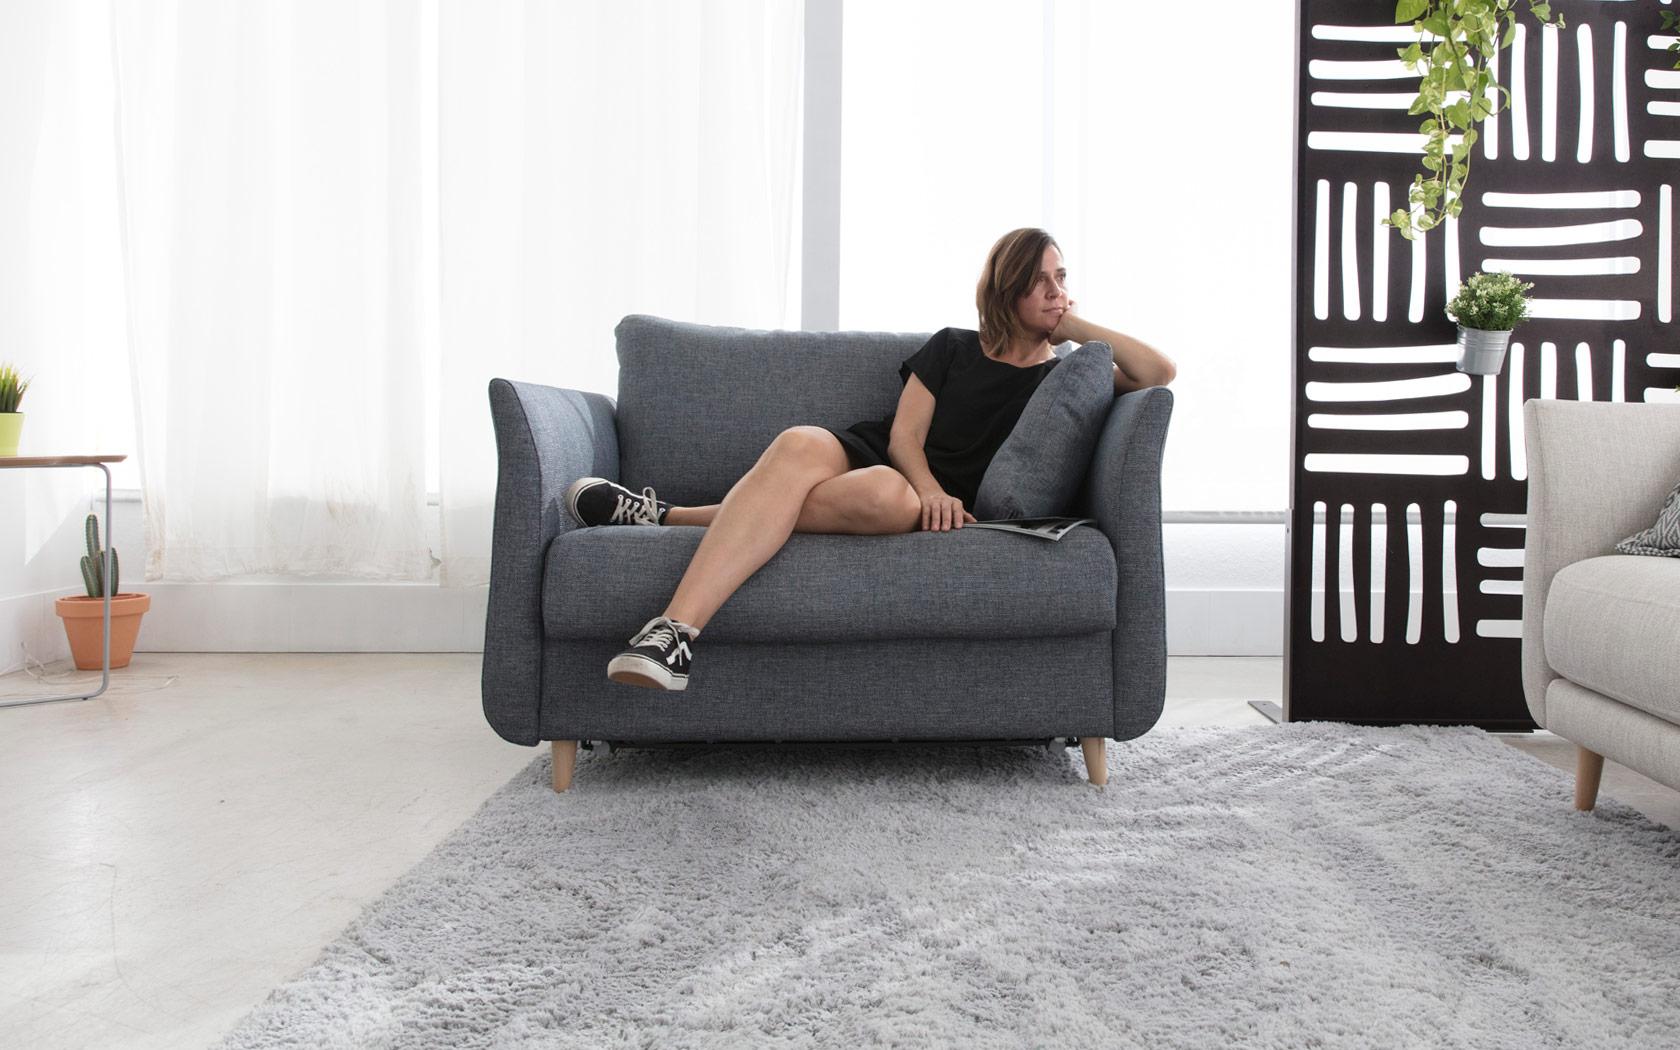 Helsinki sillón cama 2020 07